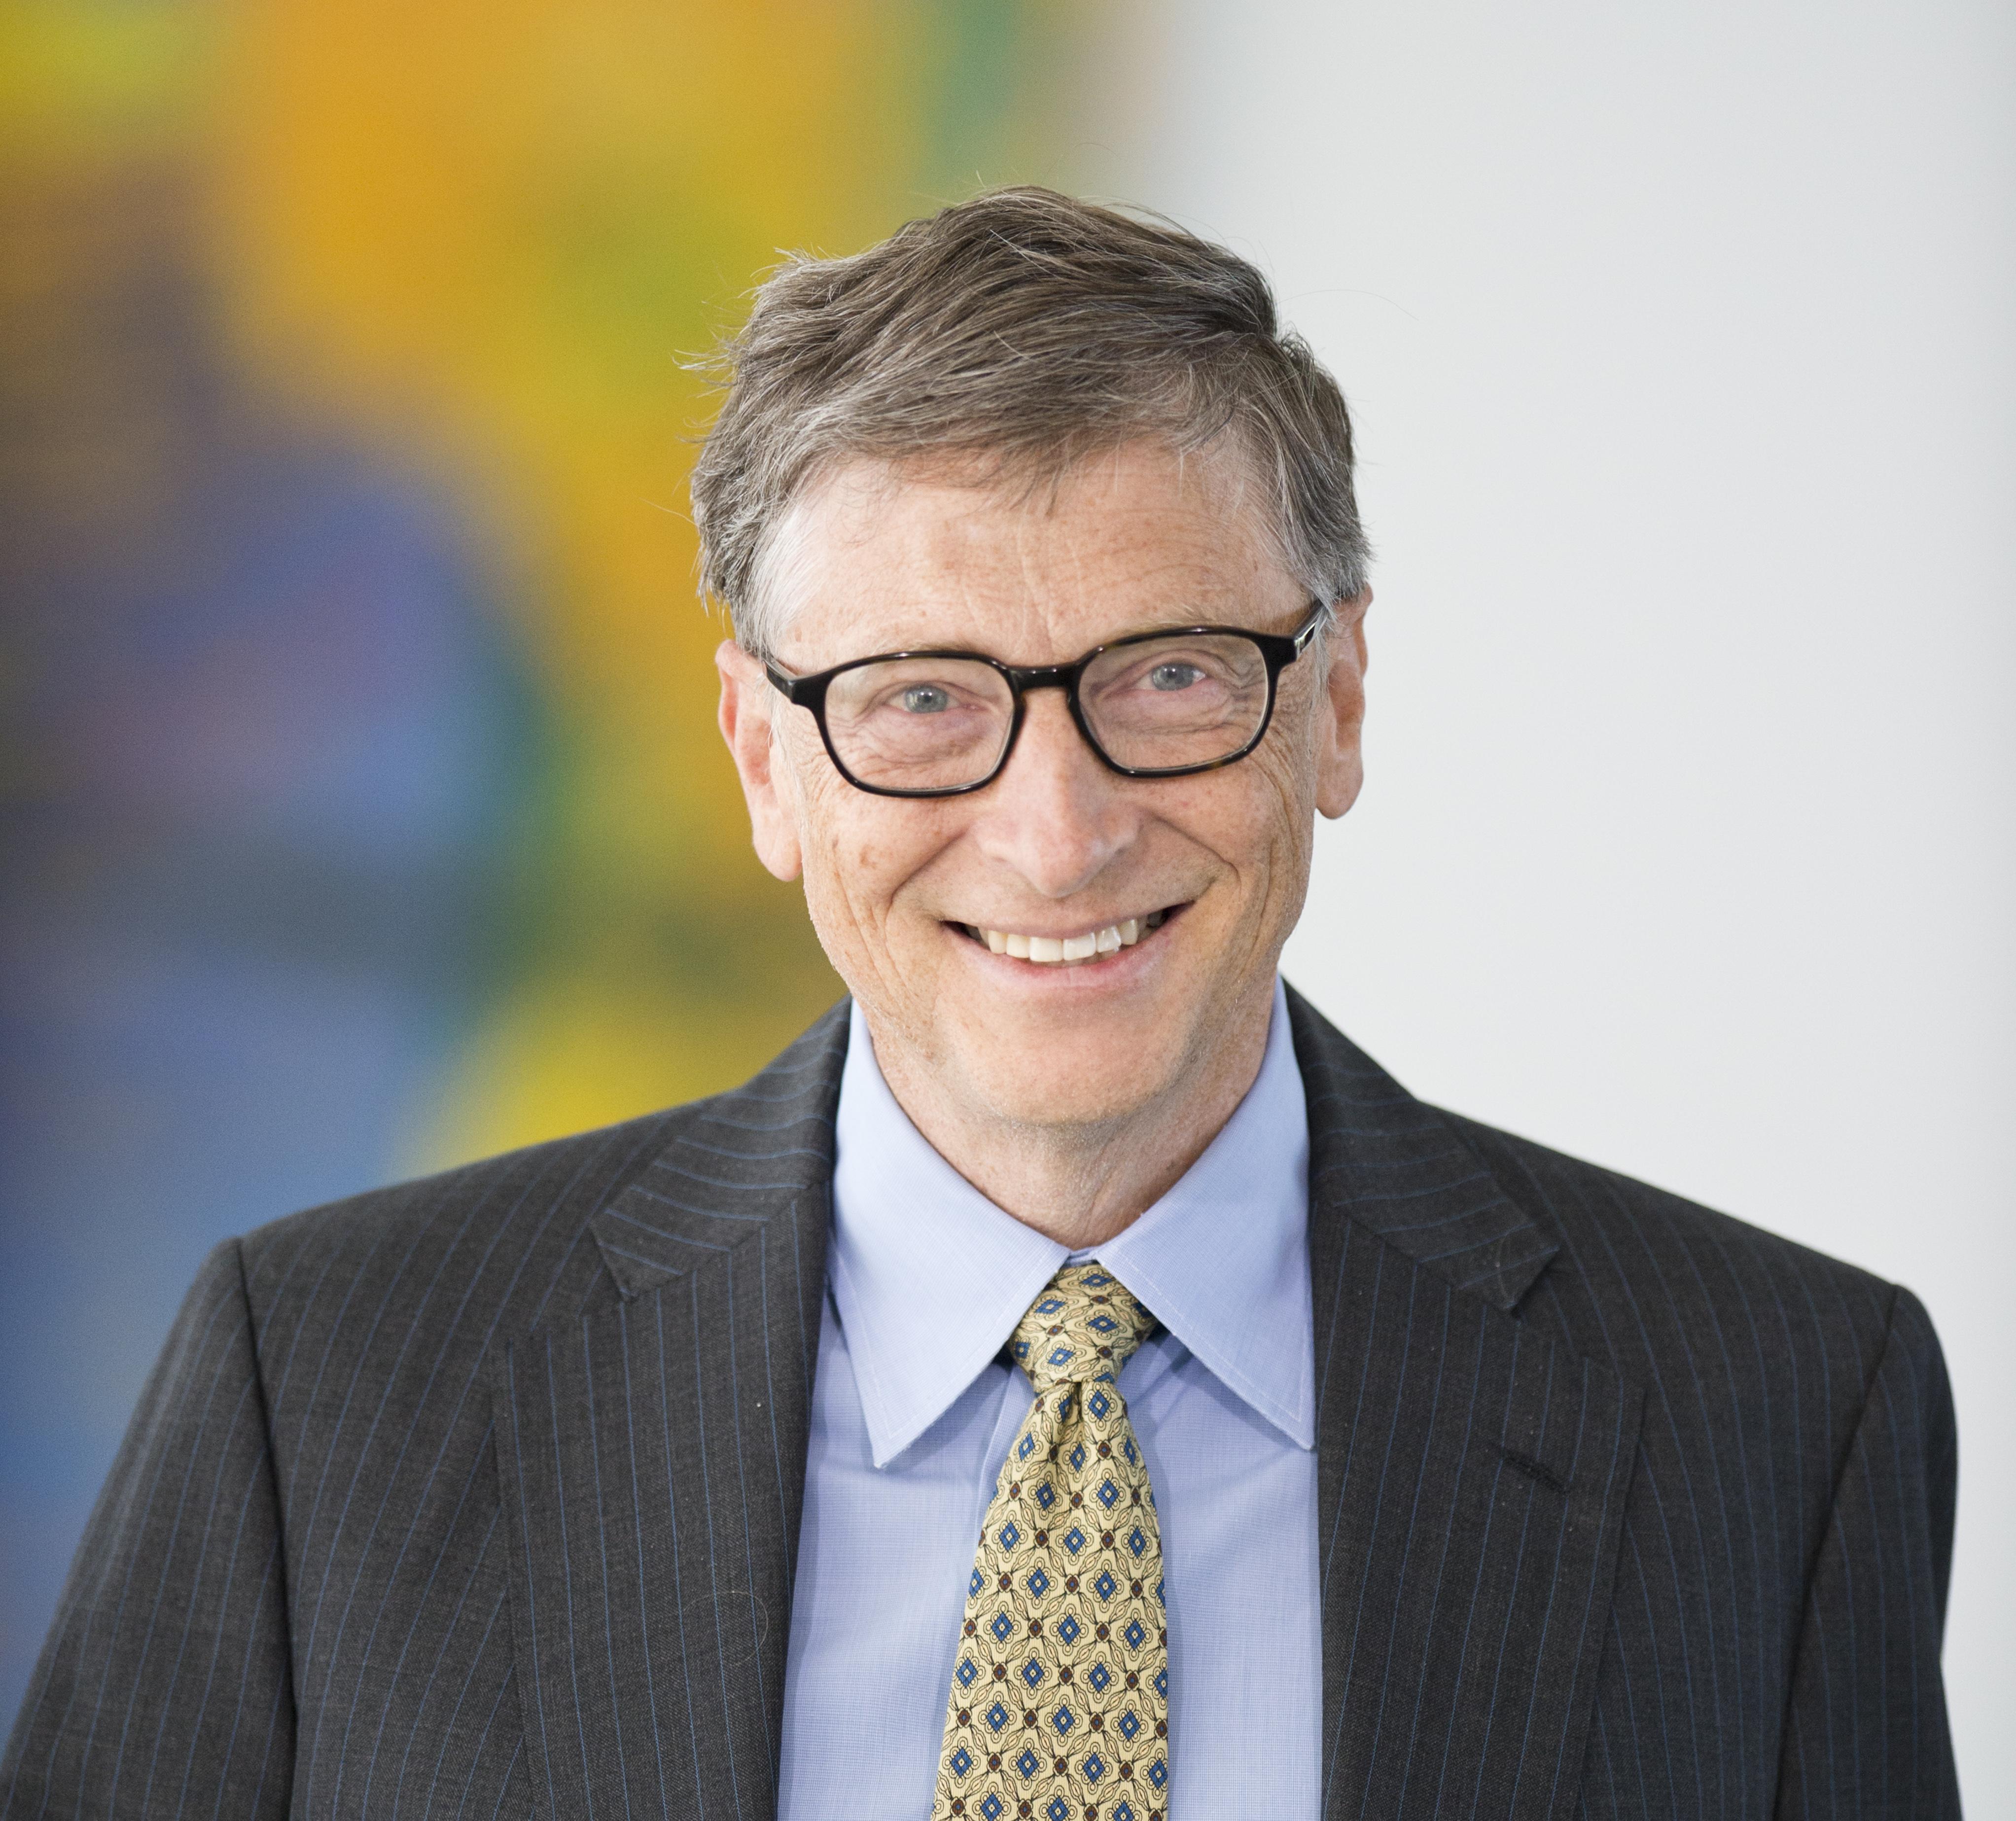 Chancellor Merkel Meets With Bill Gates